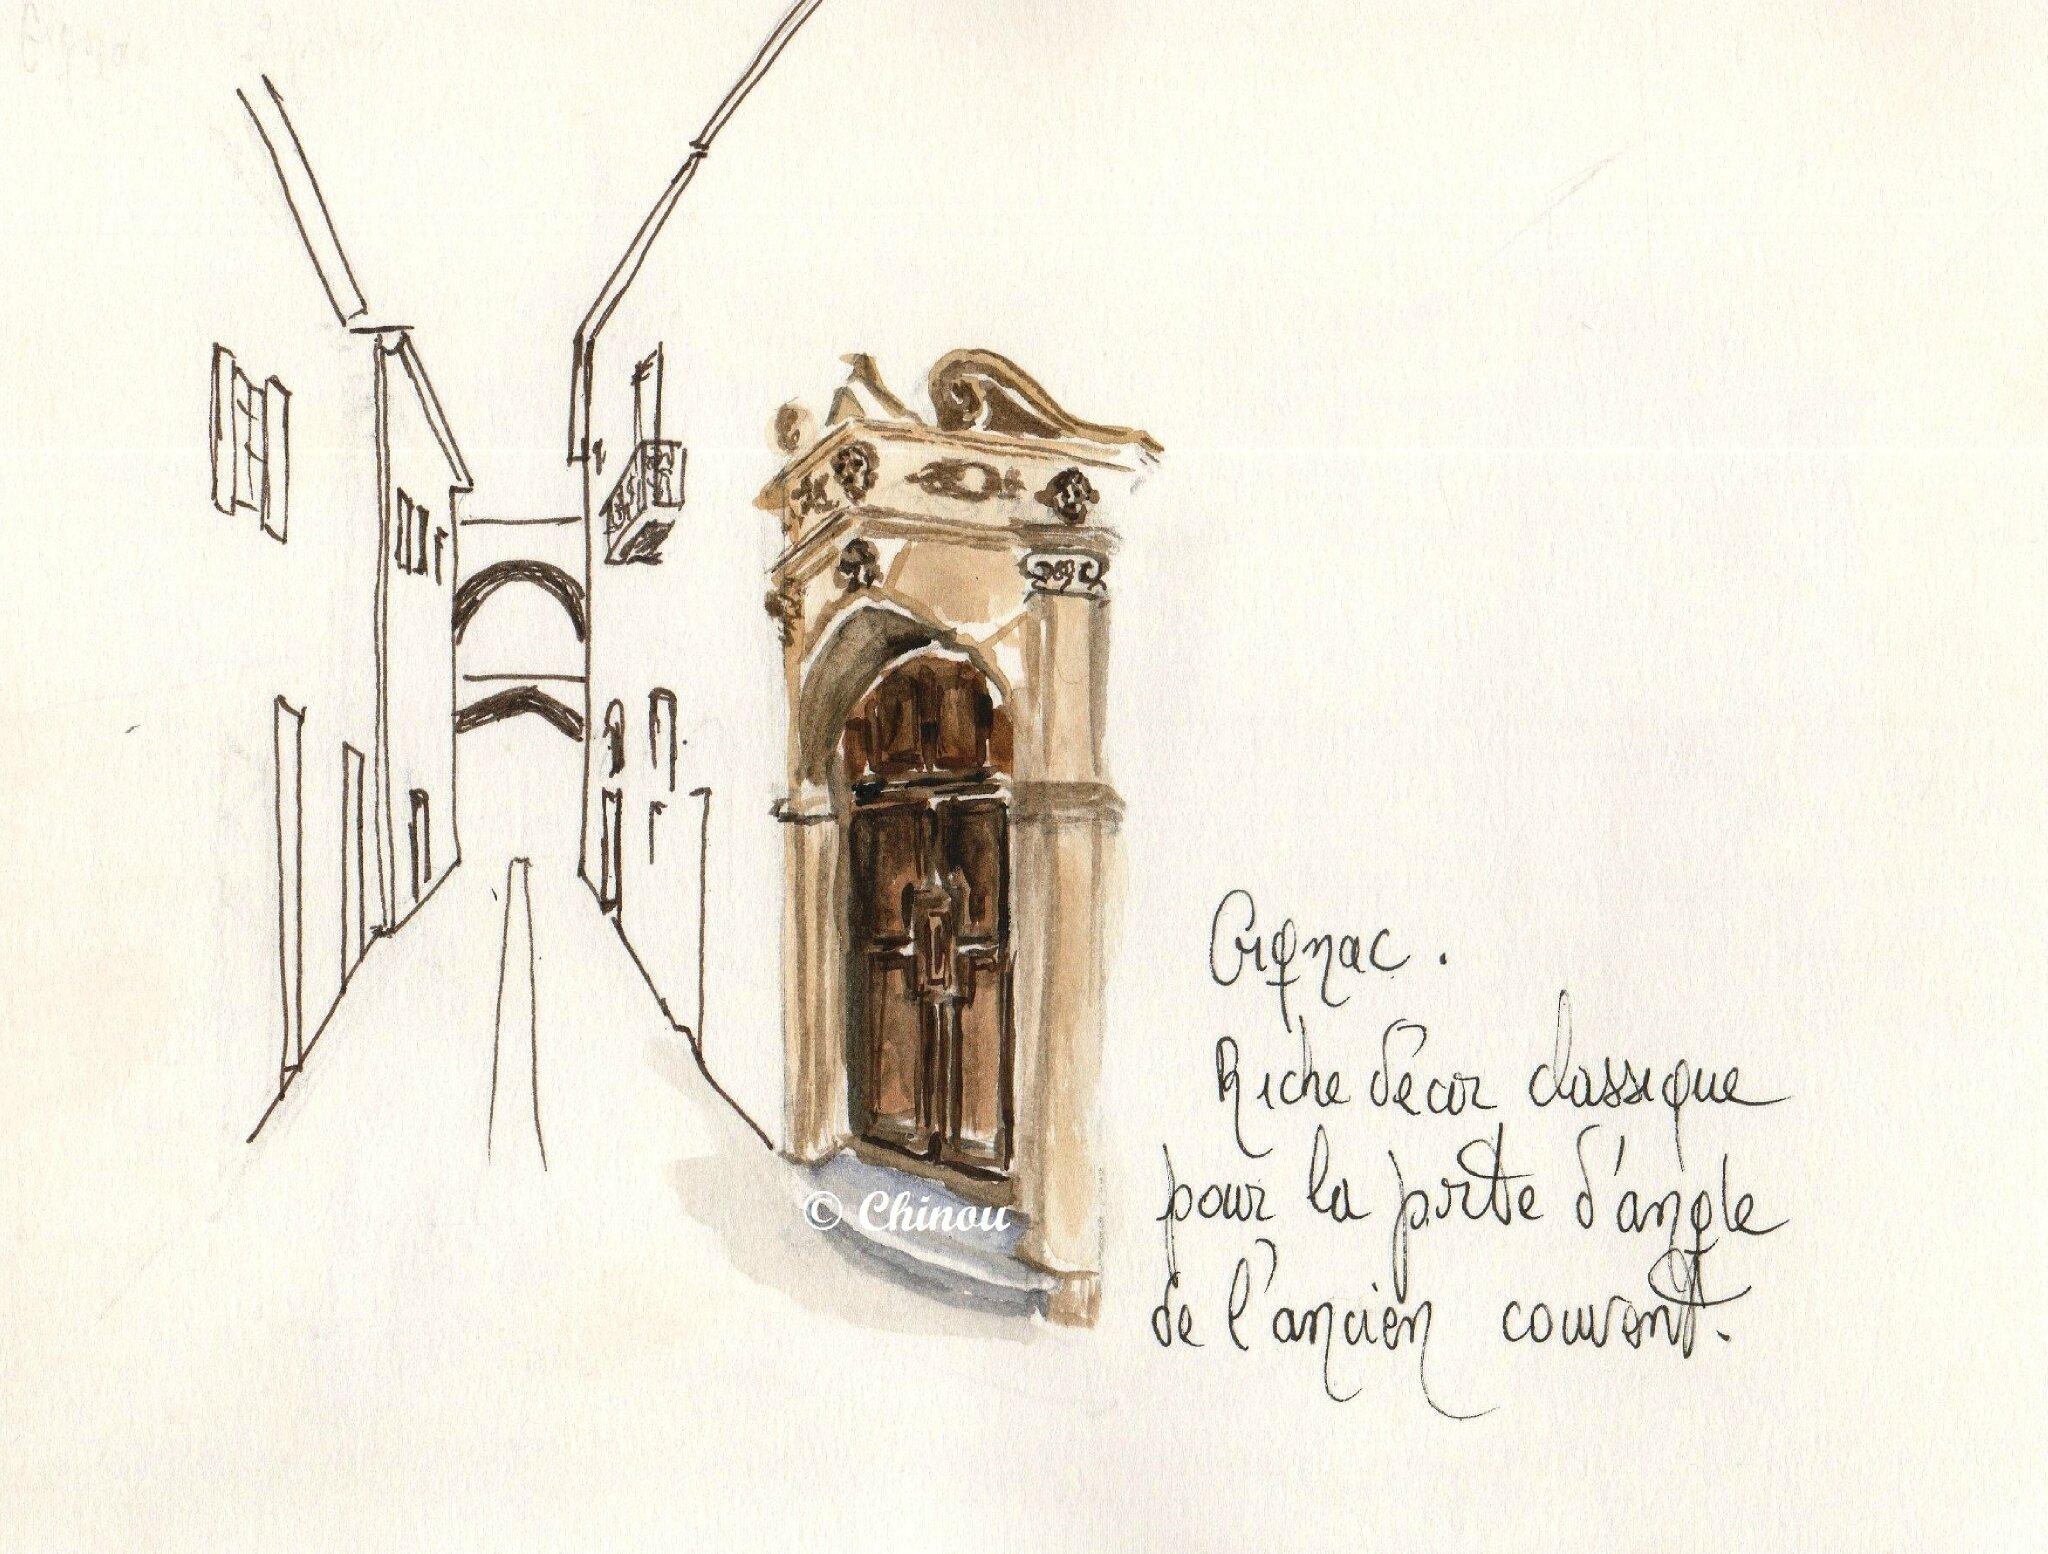 Gignac Porte du couvent